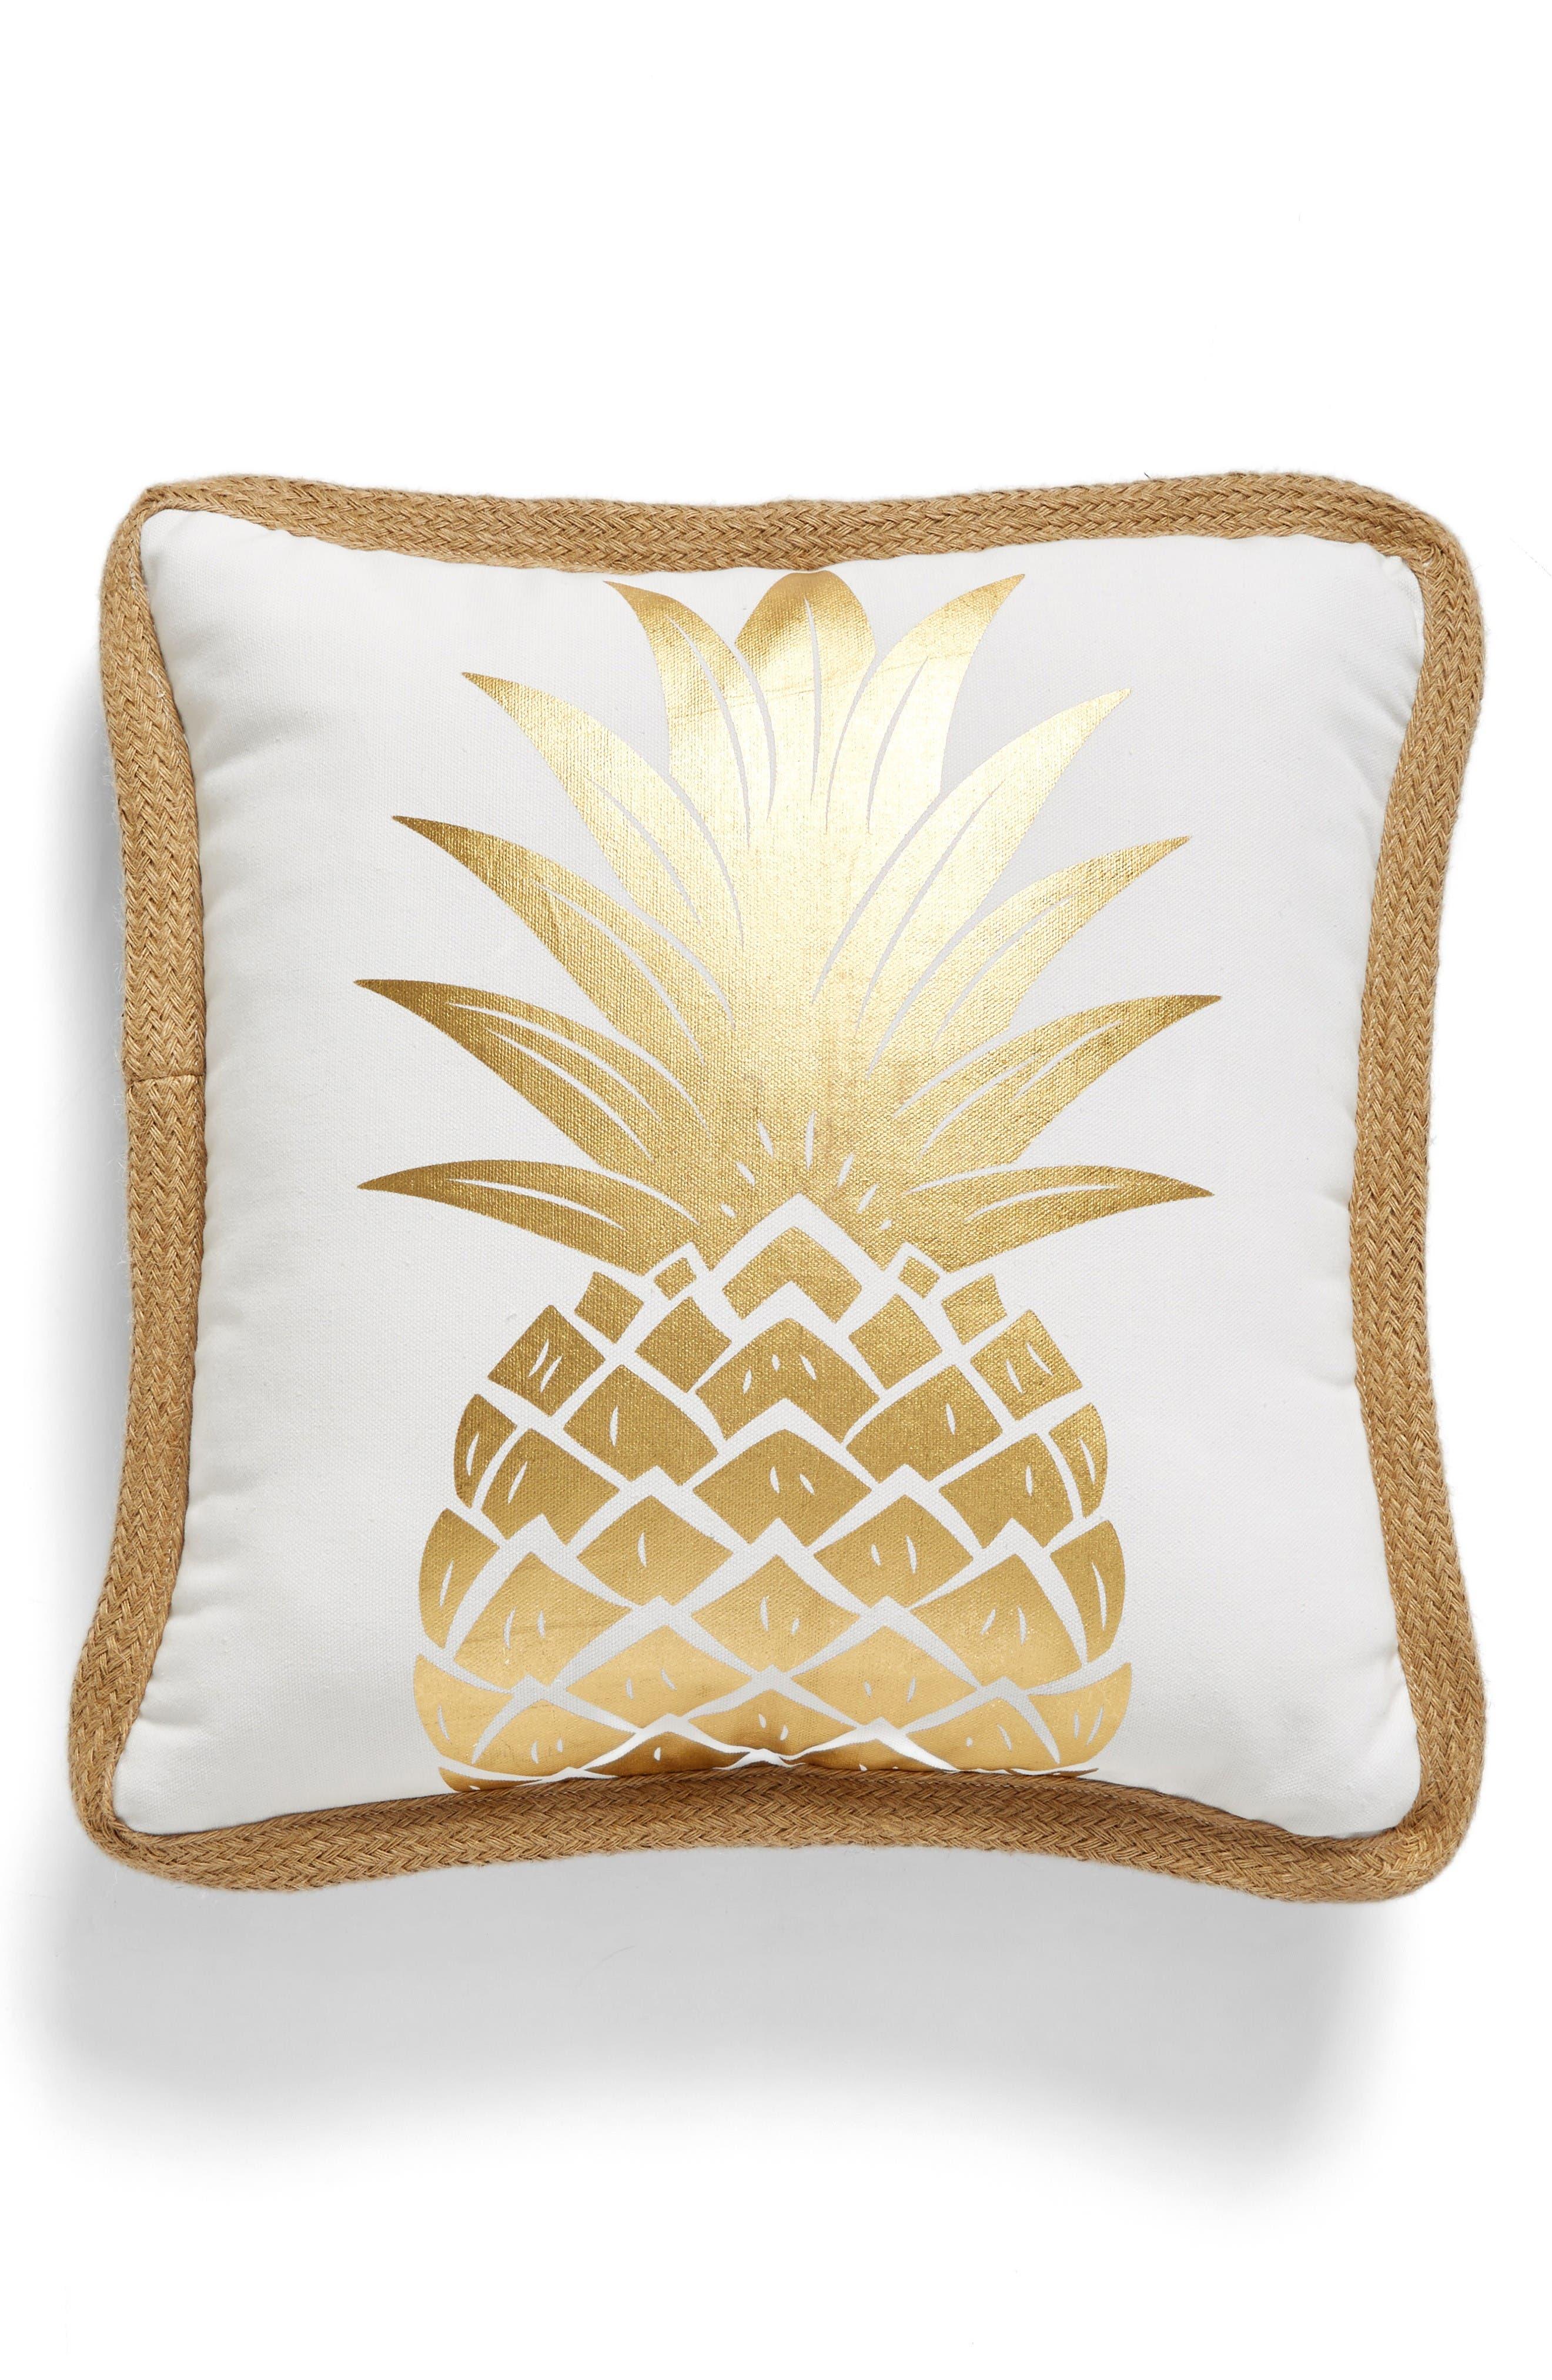 Main Image - Levtex Pineapple Pillow